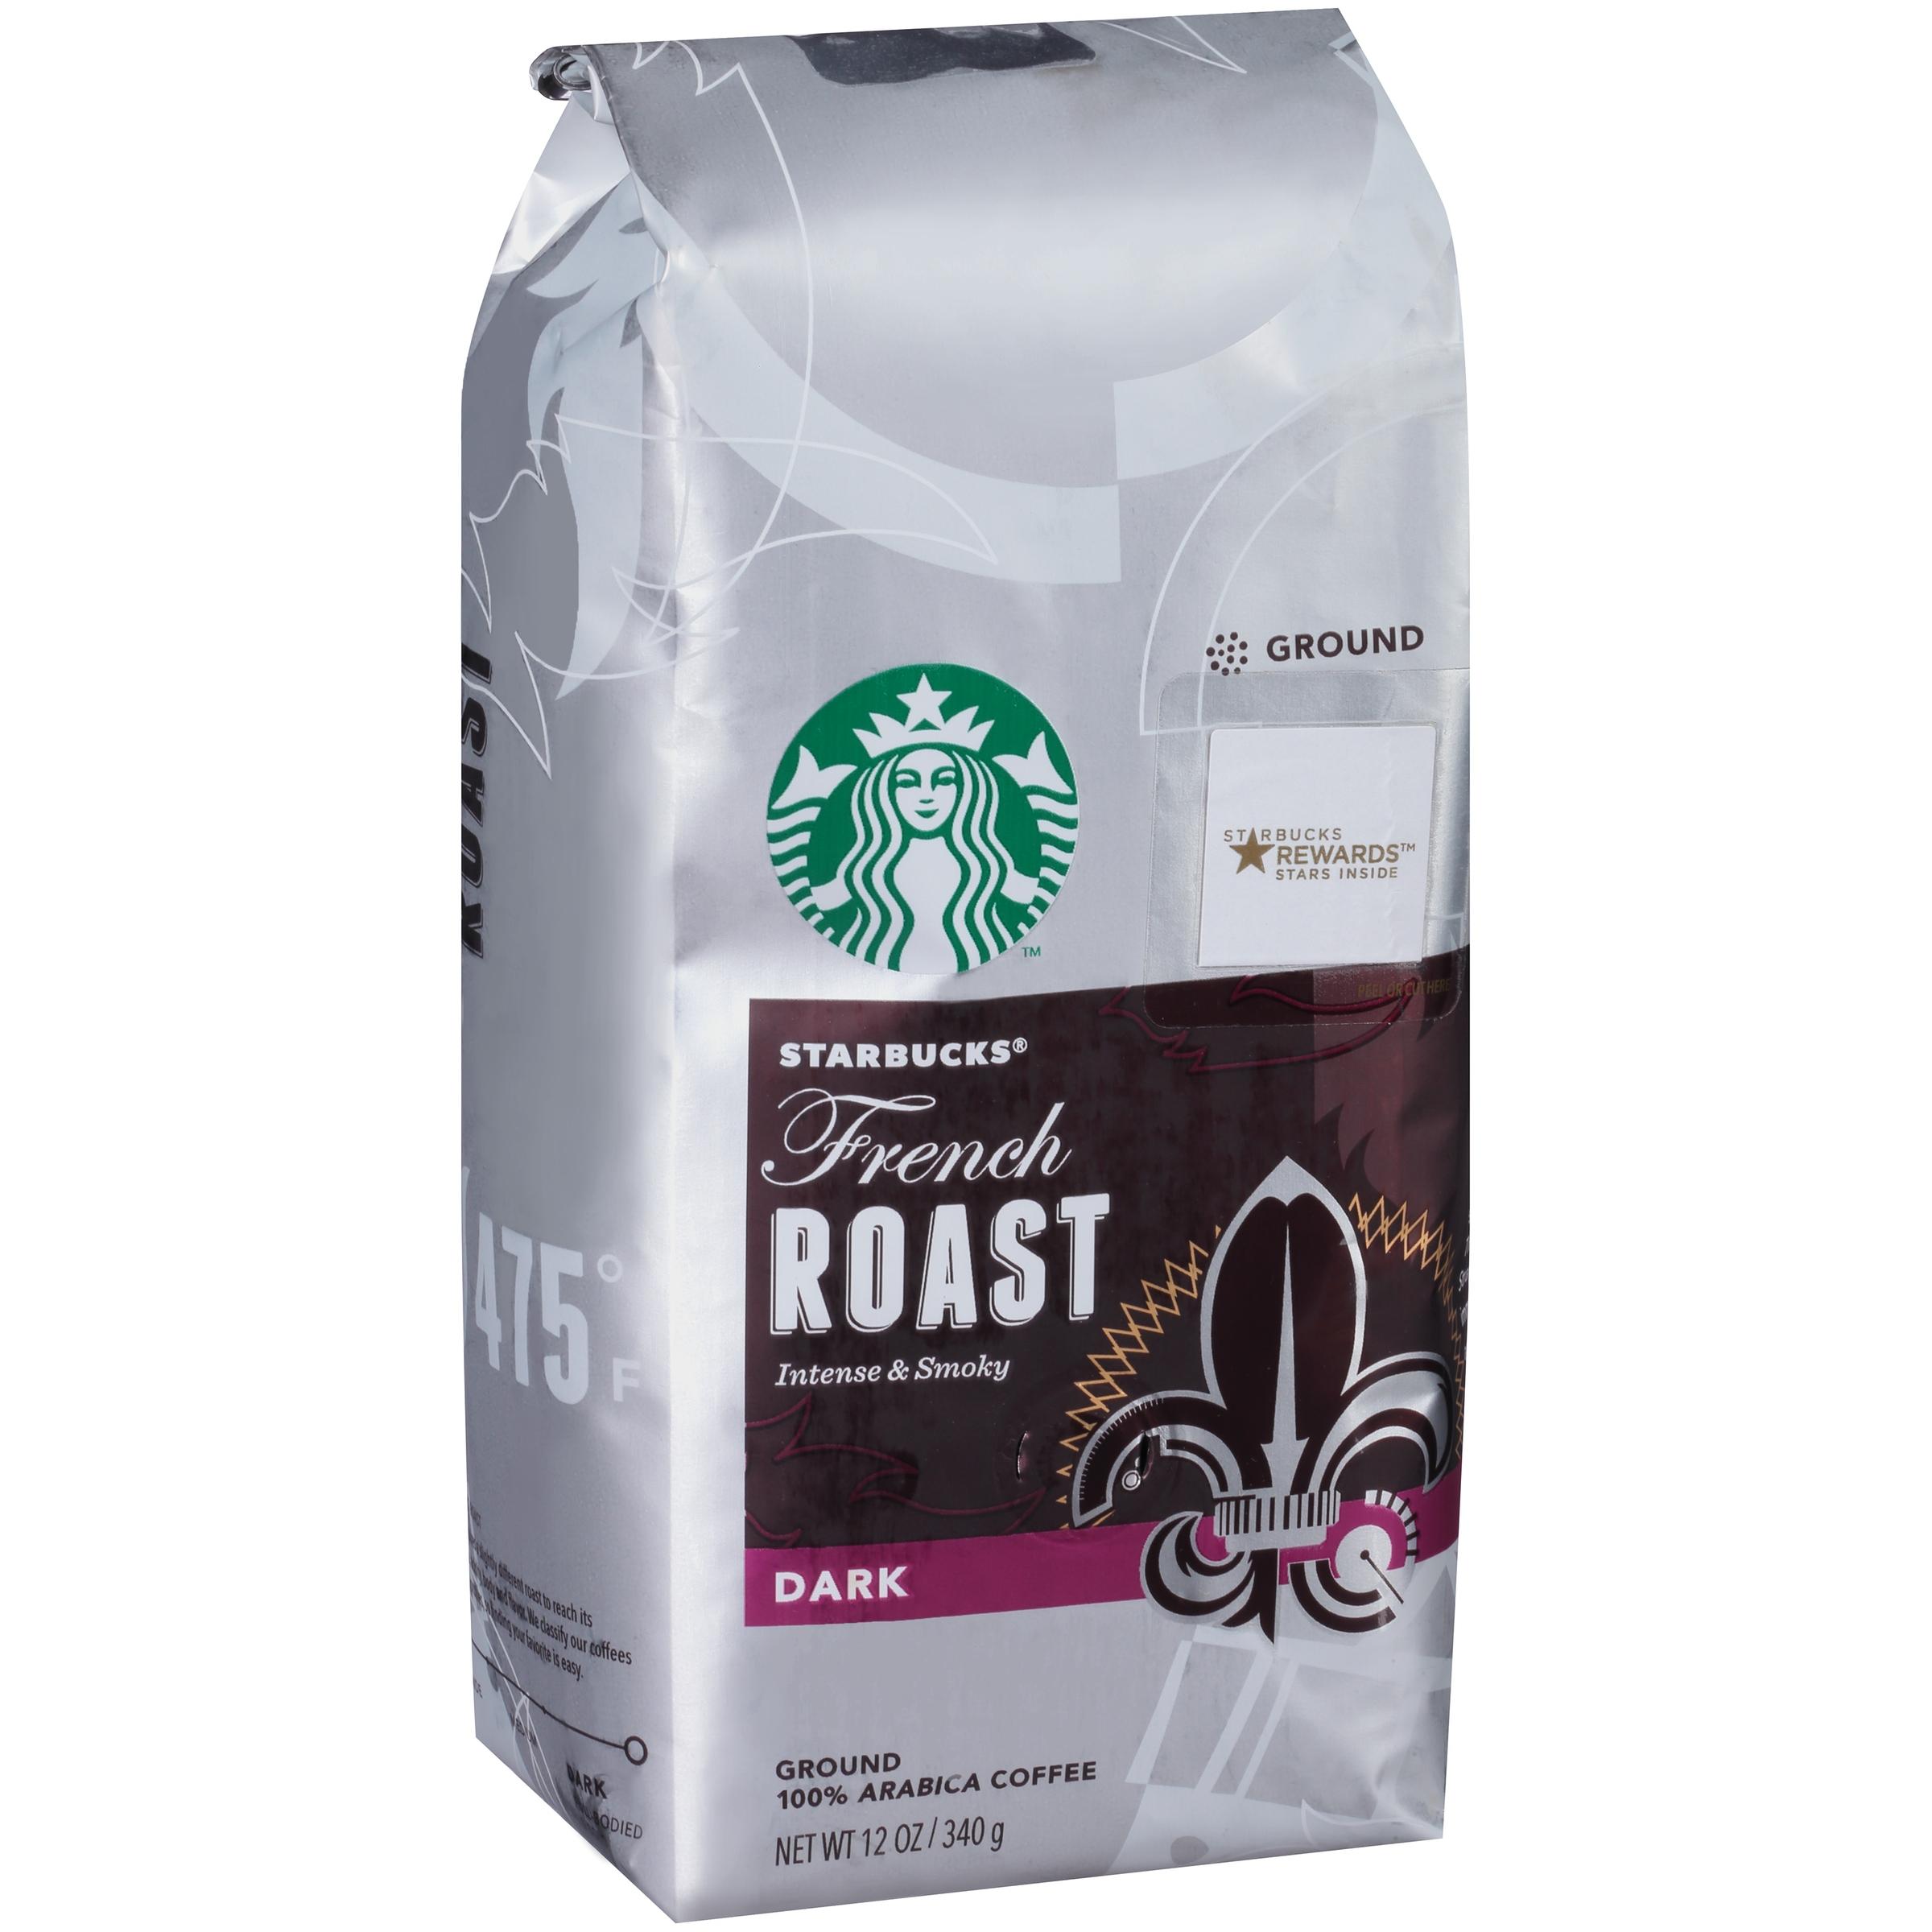 Starbucks French Roast Dark Ground Coffee 12 Oz Stand Up Bag